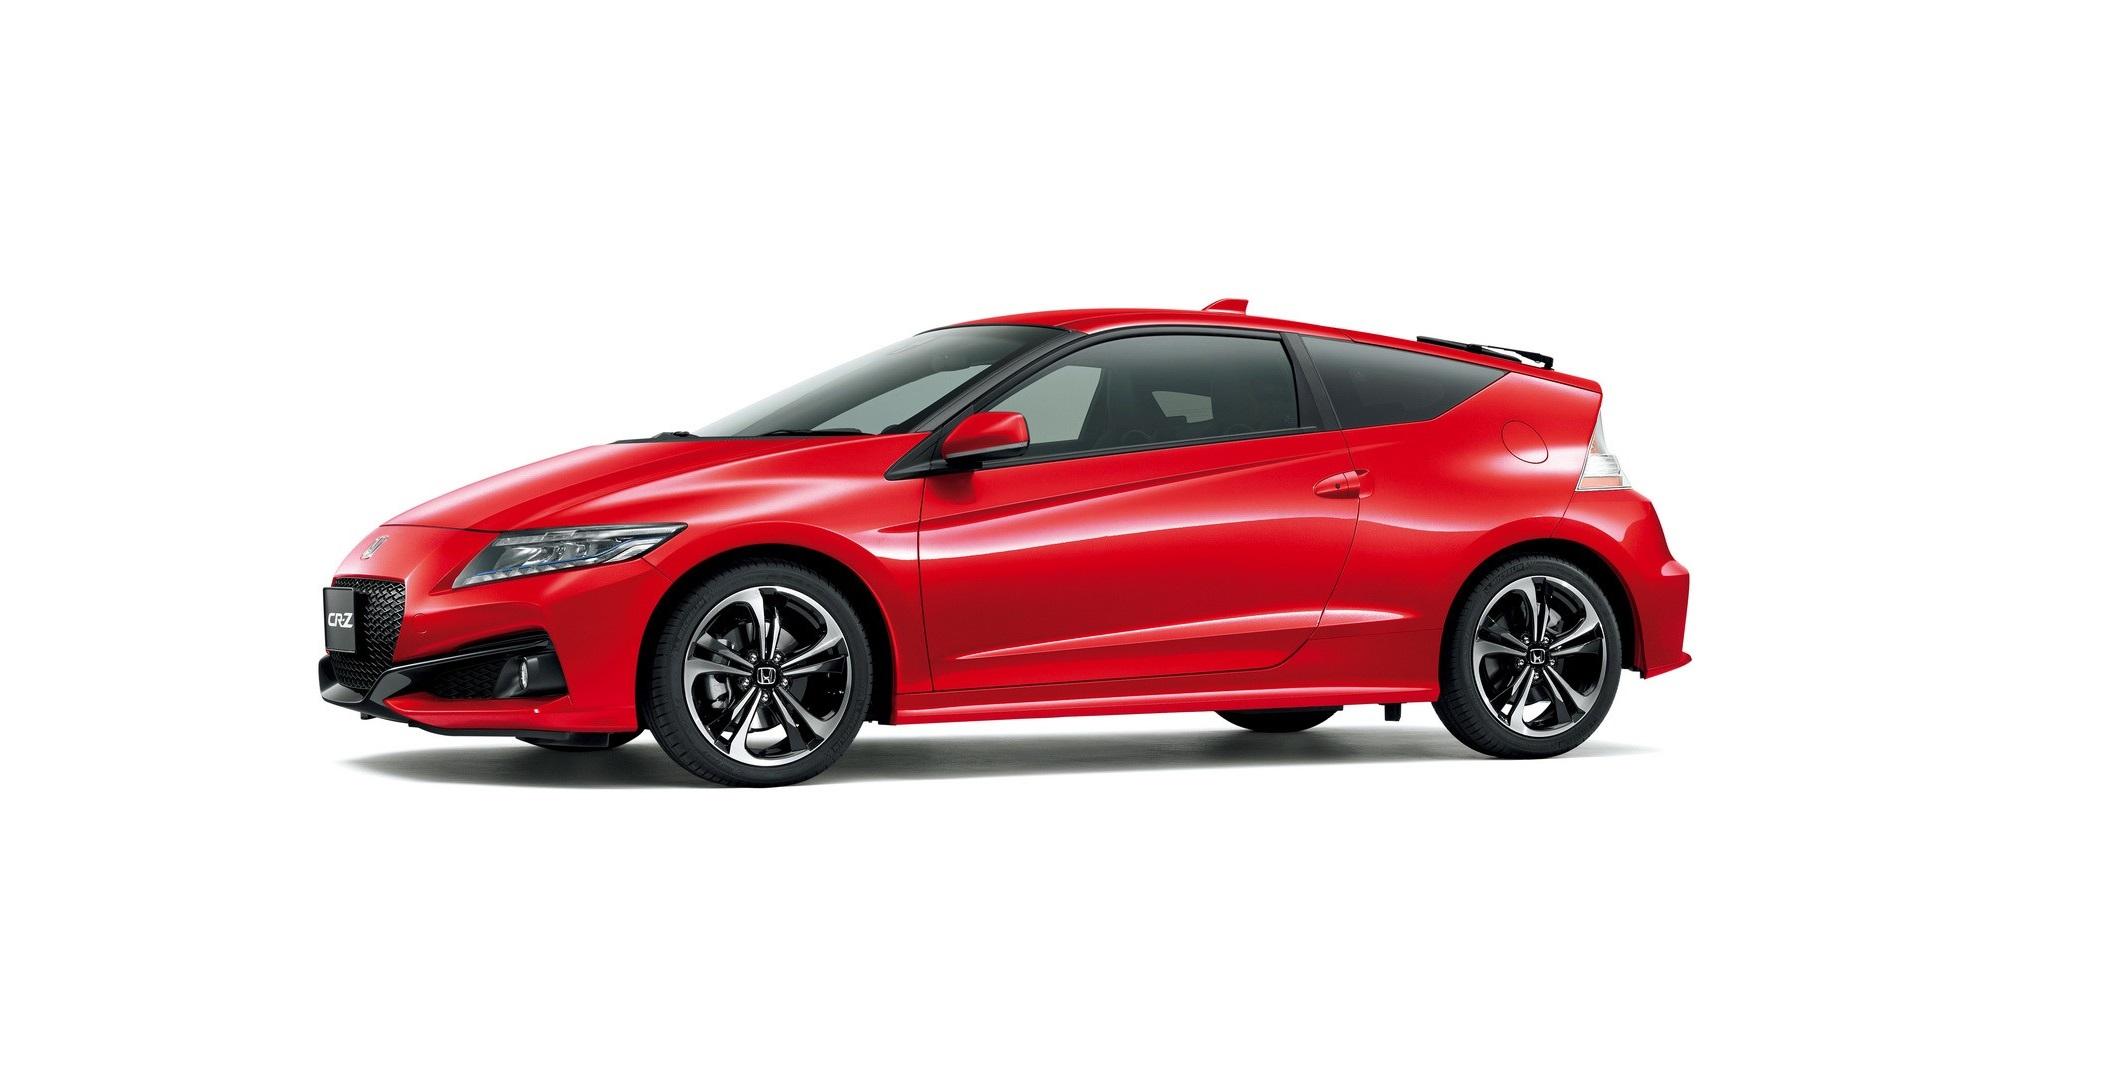 Kekurangan Harga Honda Crz Murah Berkualitas